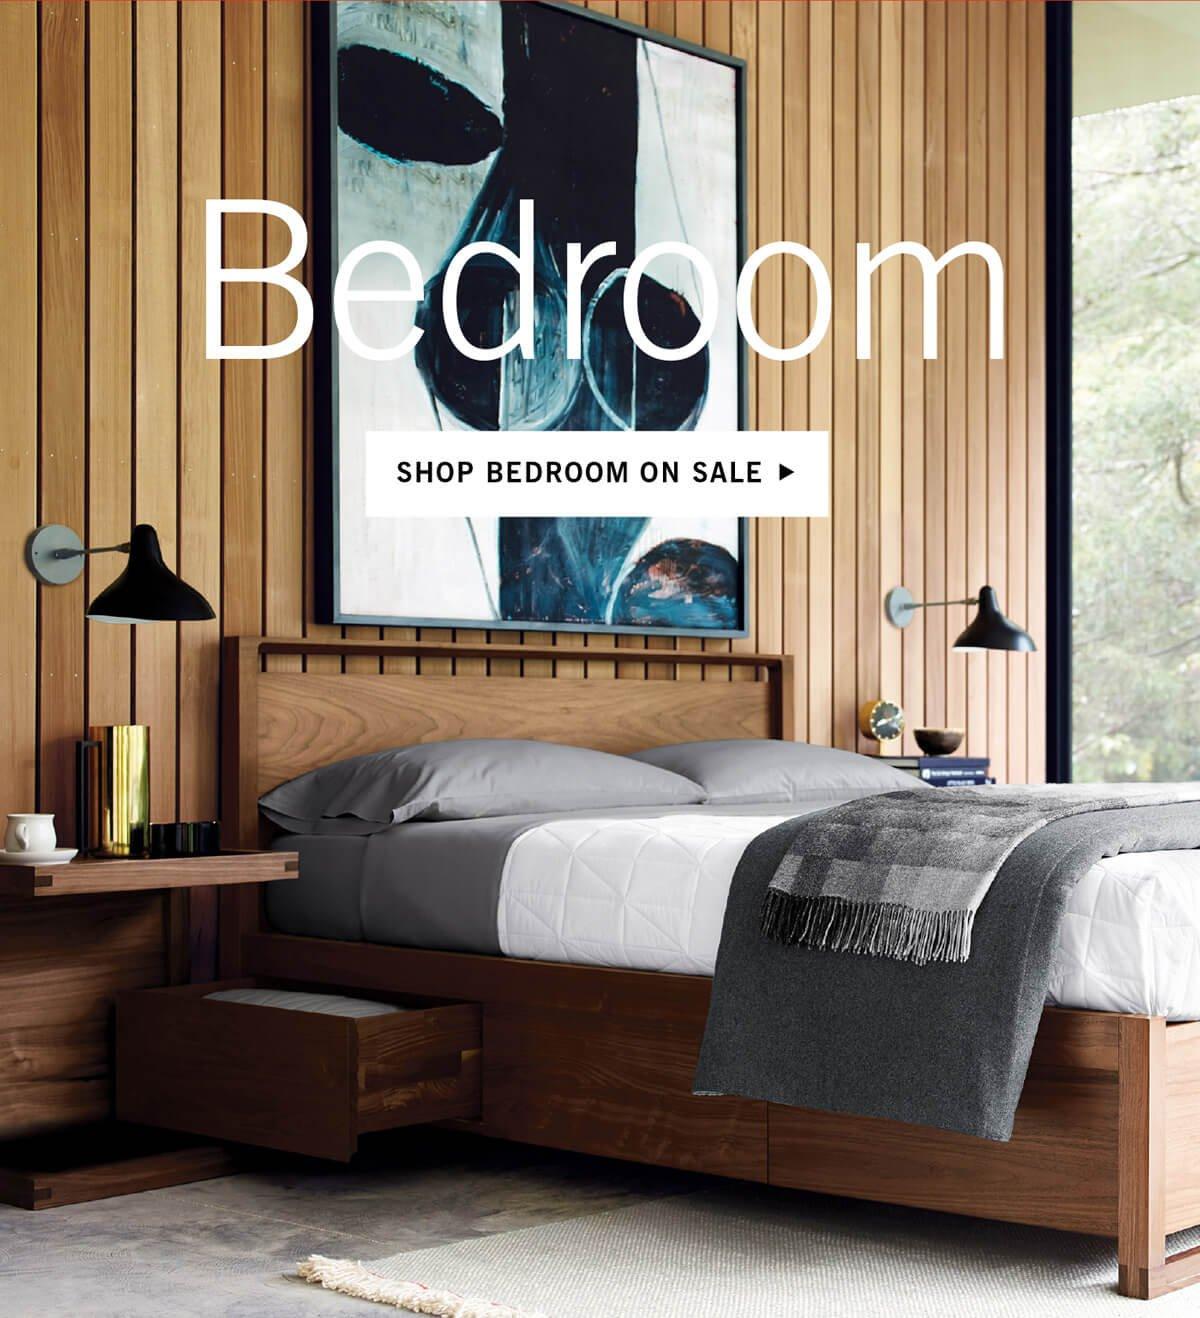 SHOP BEDROOM ON SALE